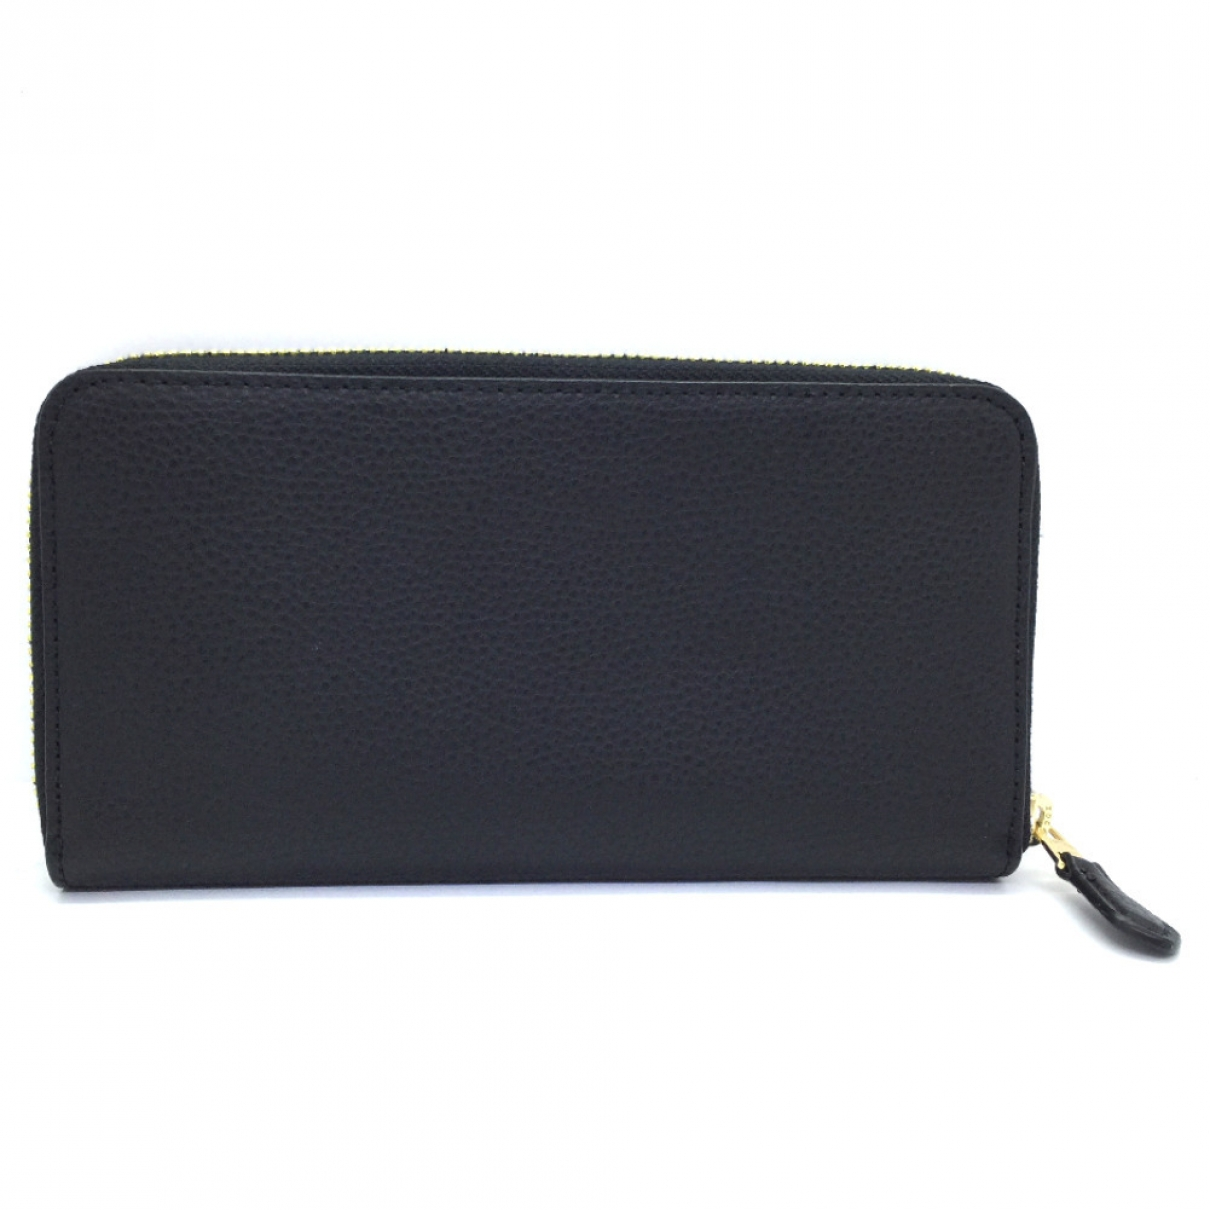 Coach \N Black Leather wallet for Women \N